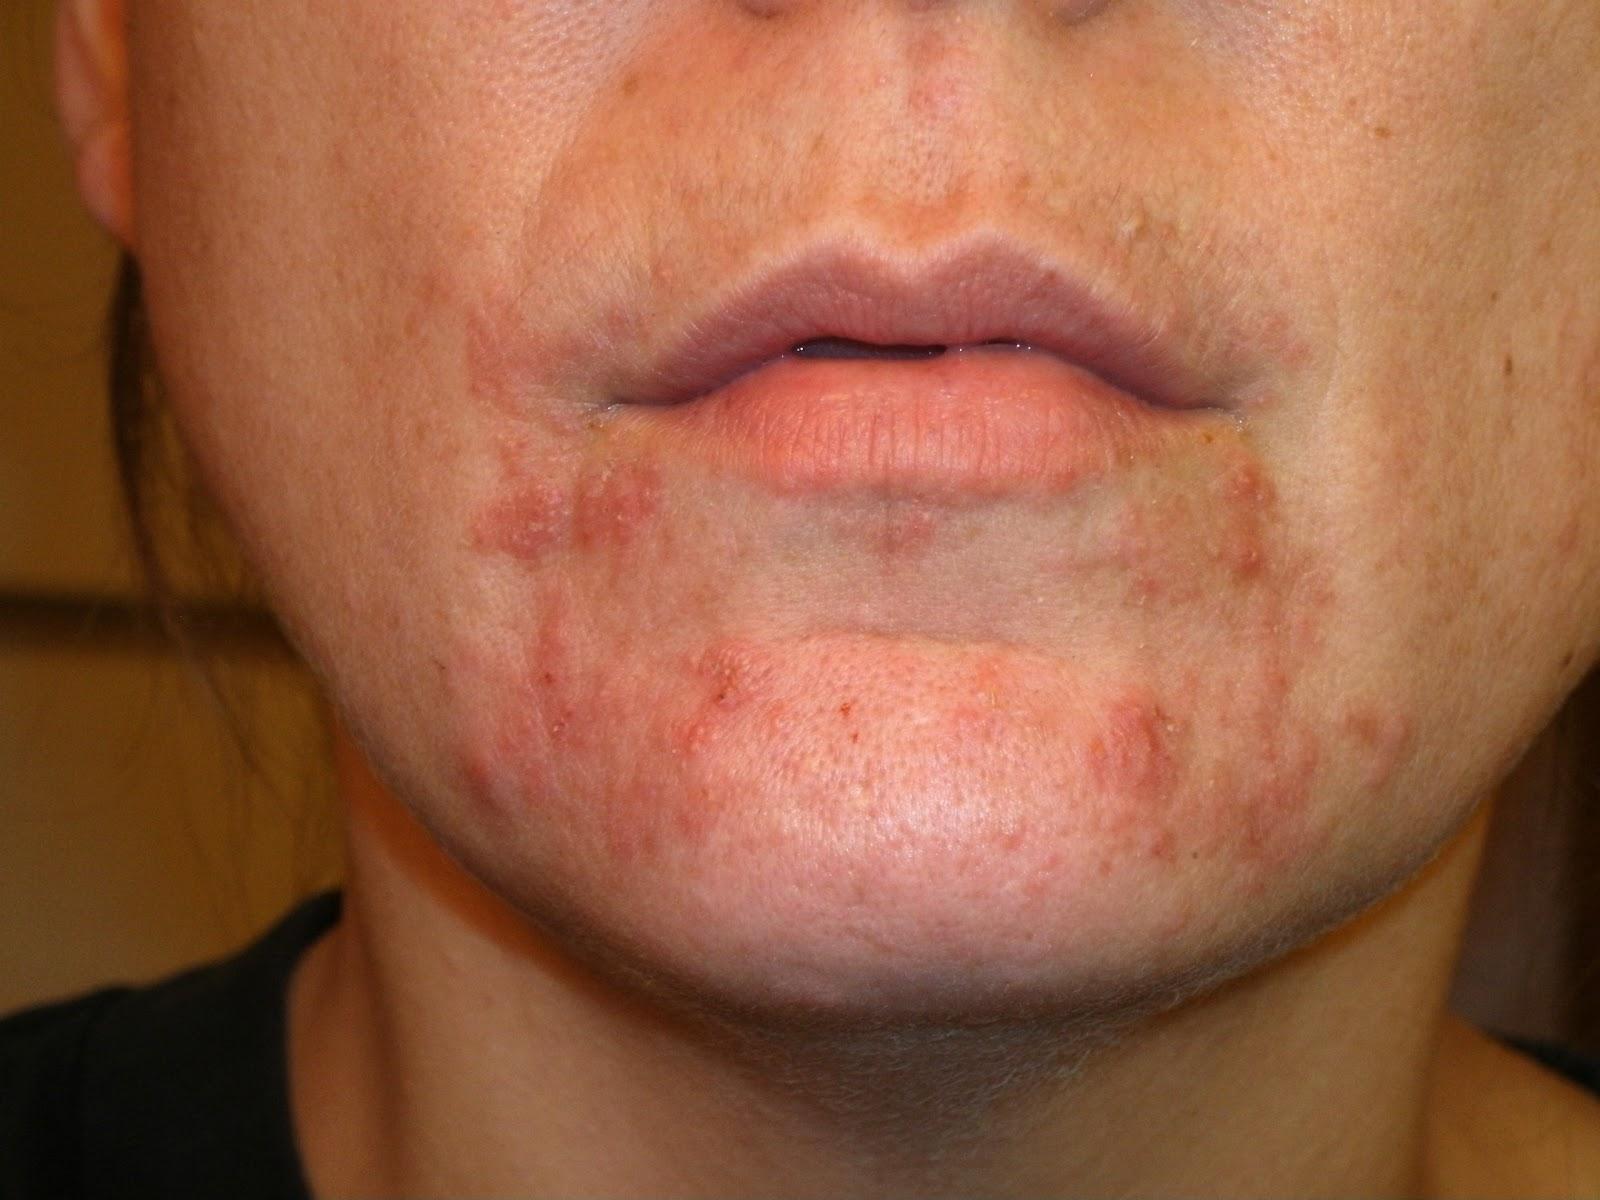 staphylococcus rash